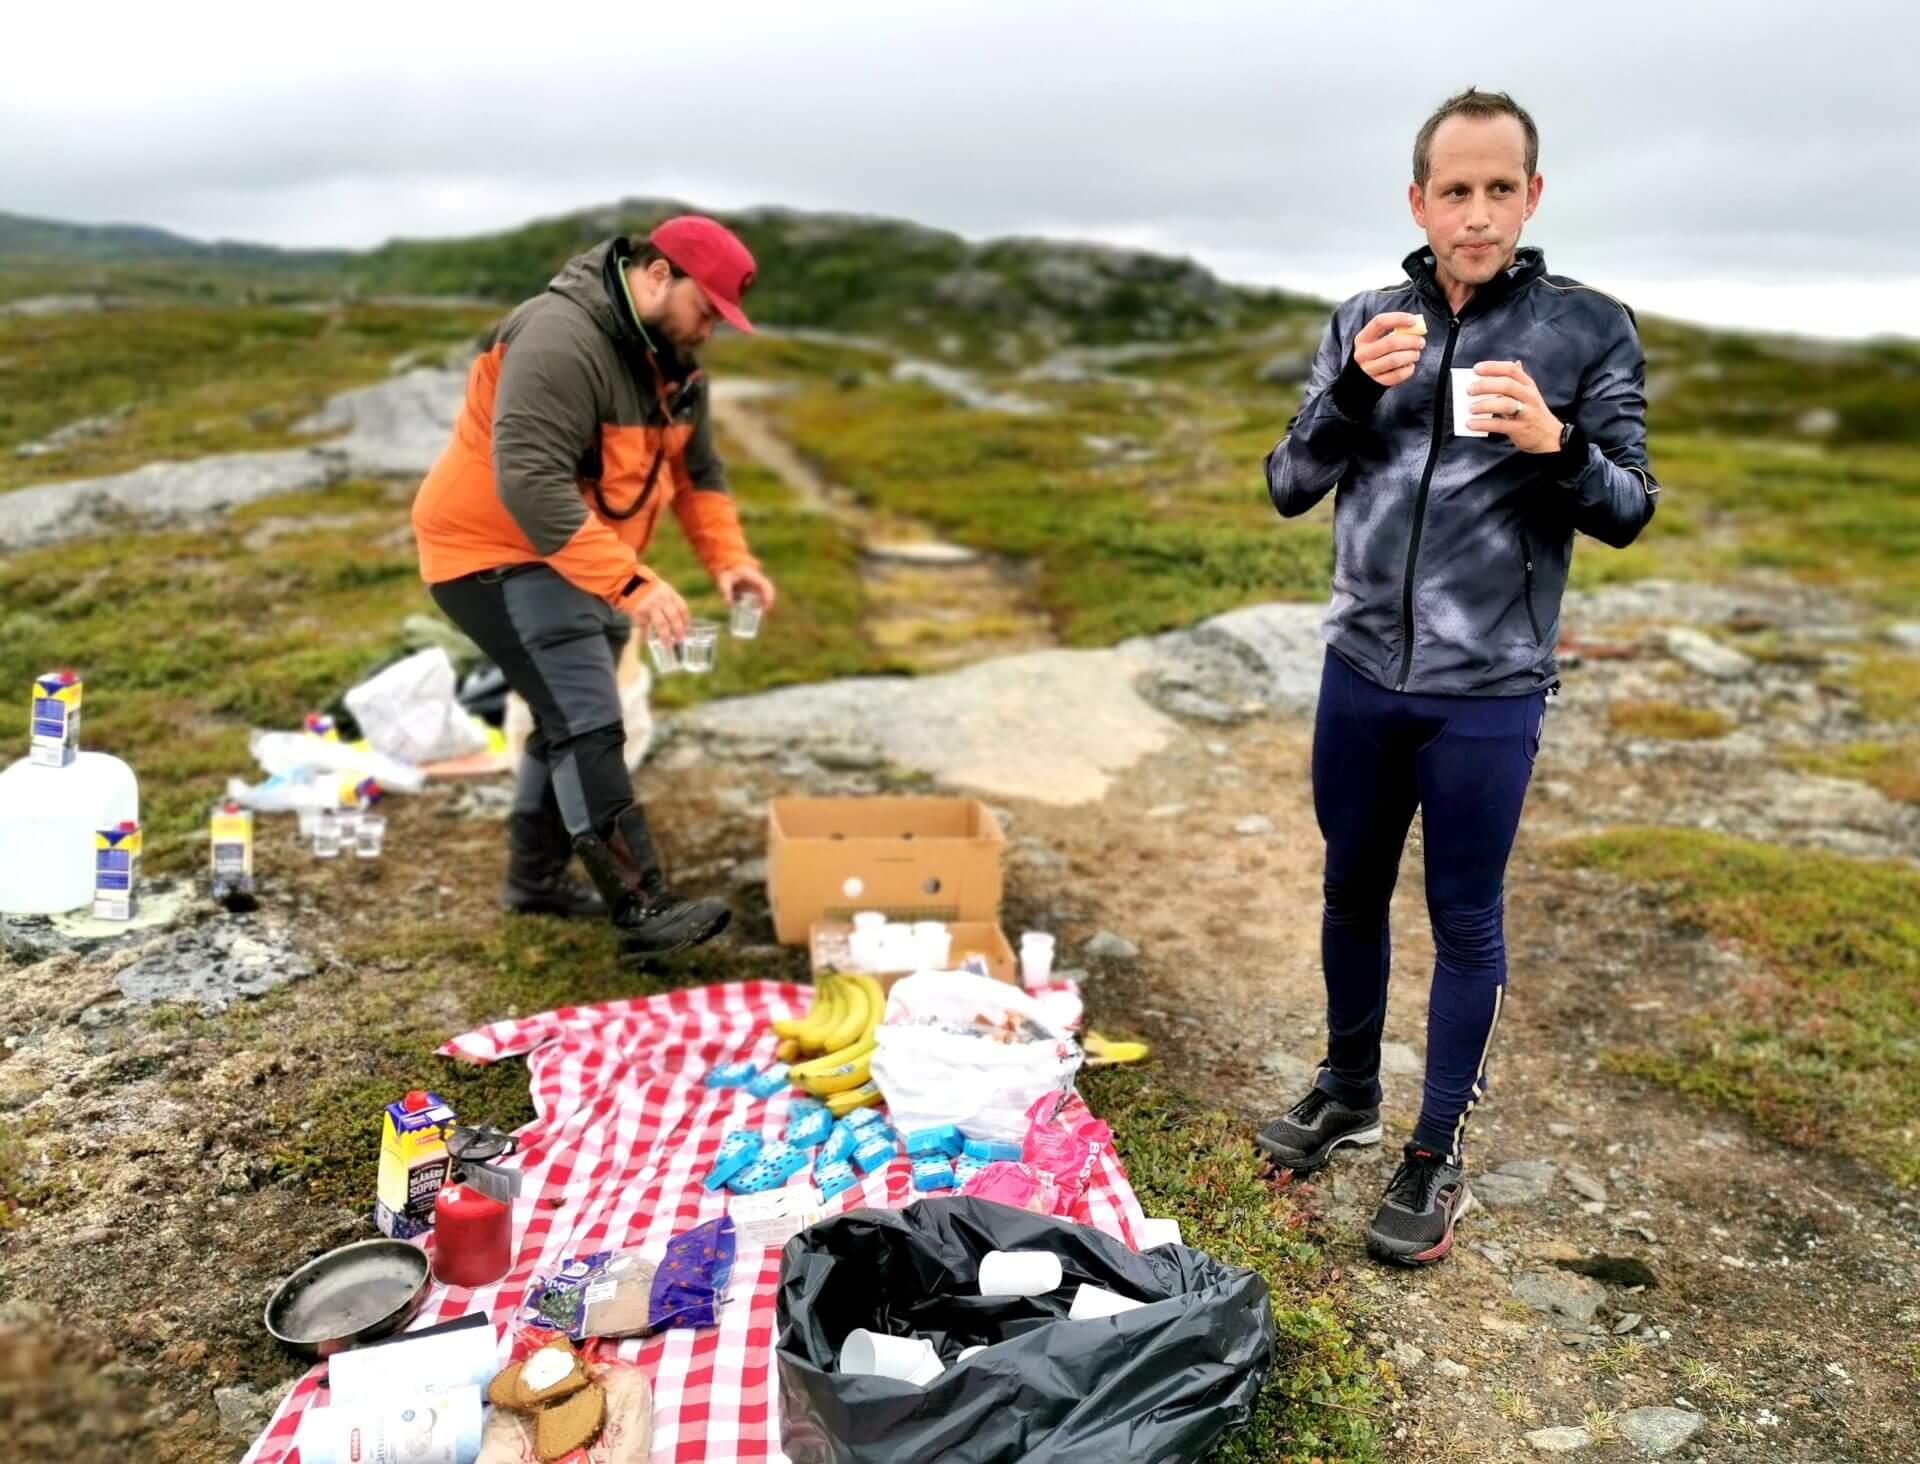 Arctic Circle Race 2019 Polcirkelloppet Guijaure kontr M